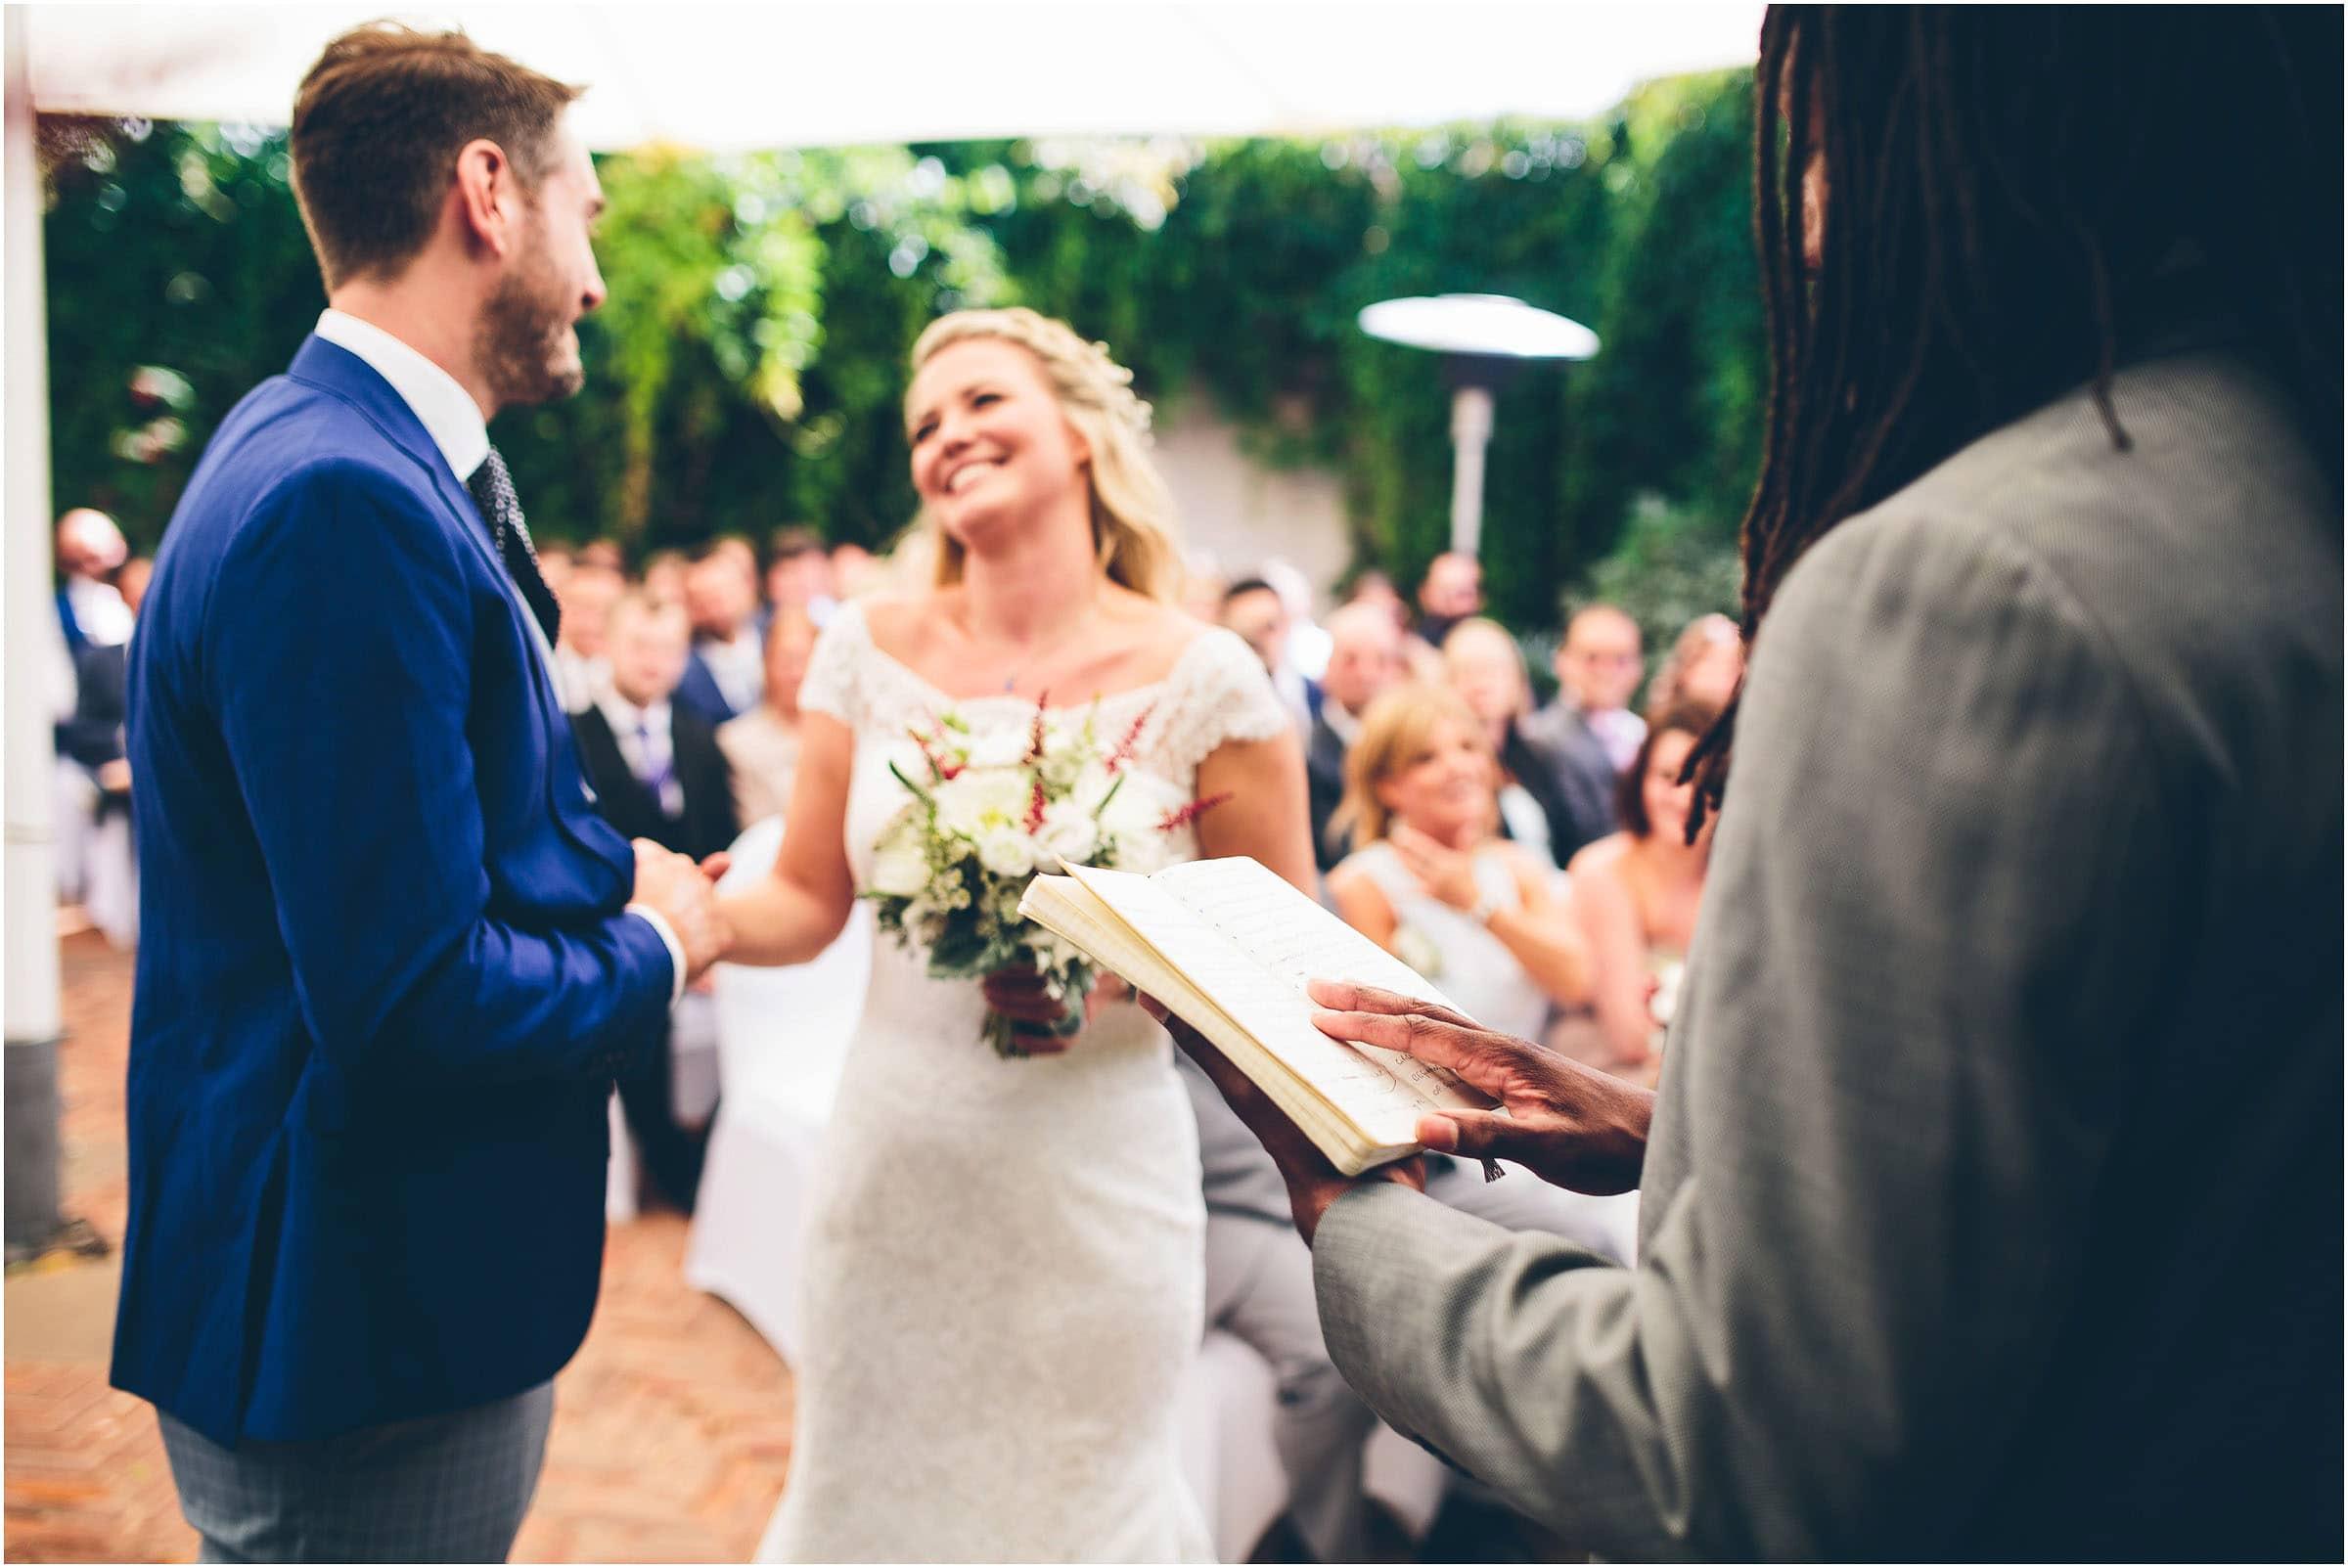 Kensington_Roof_Gardens_Wedding_Photography_0035